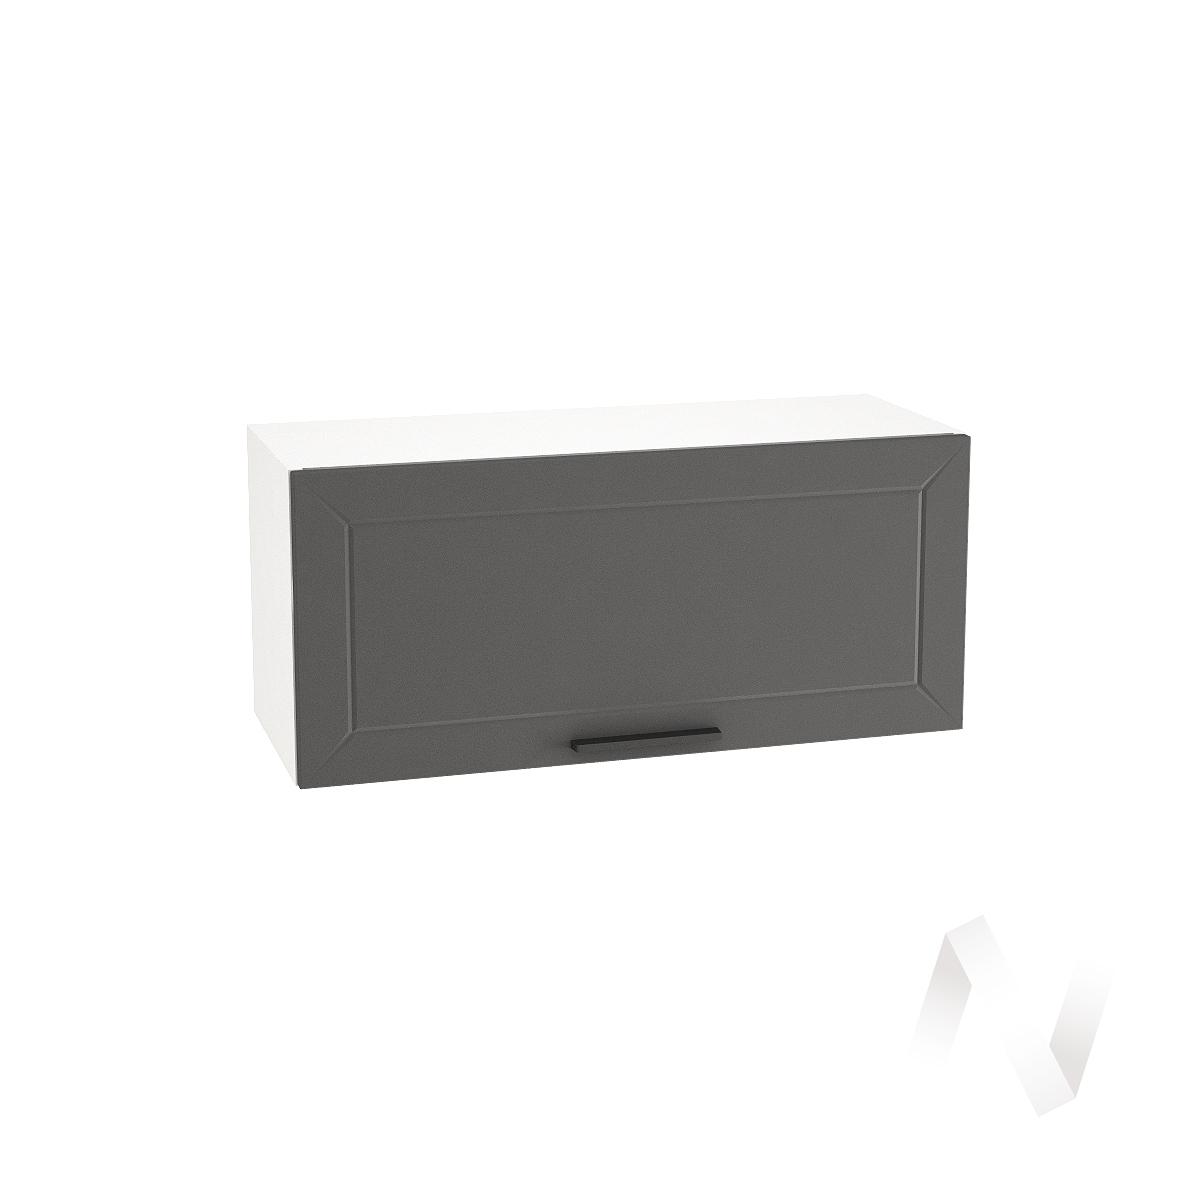 "Кухня ""Глетчер"": Шкаф верхний горизонтальный 800, ШВГ 800 (Маренго силк/корпус белый)"